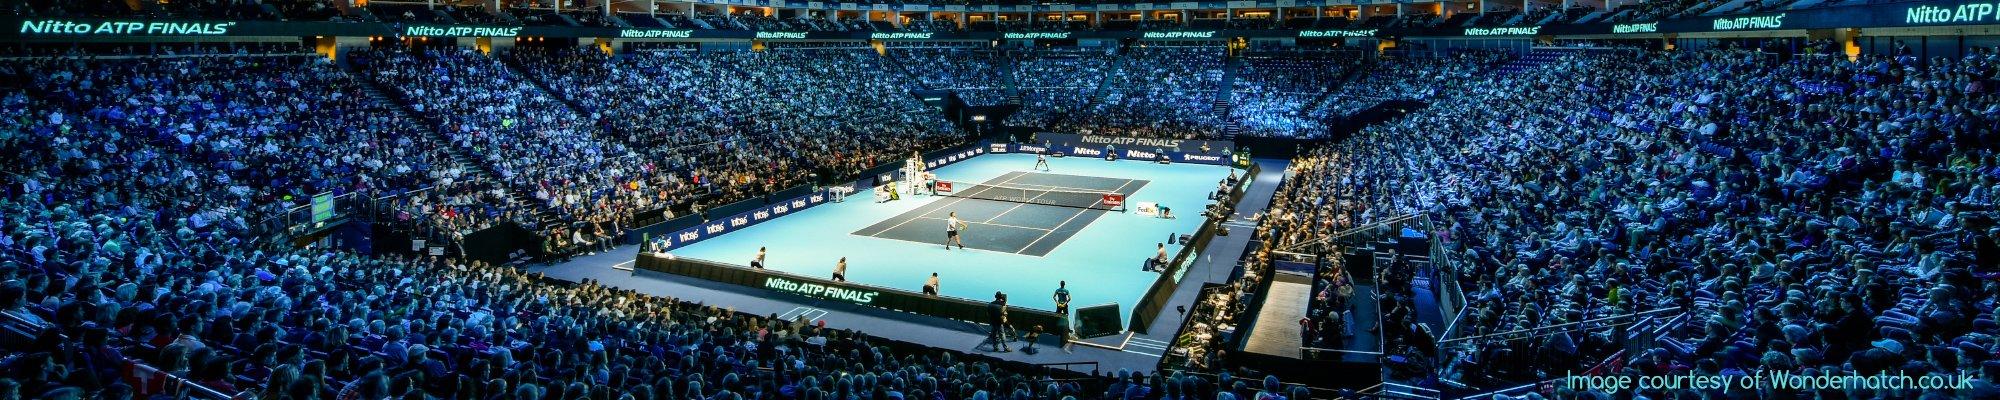 2018 Nitto ATP Finals